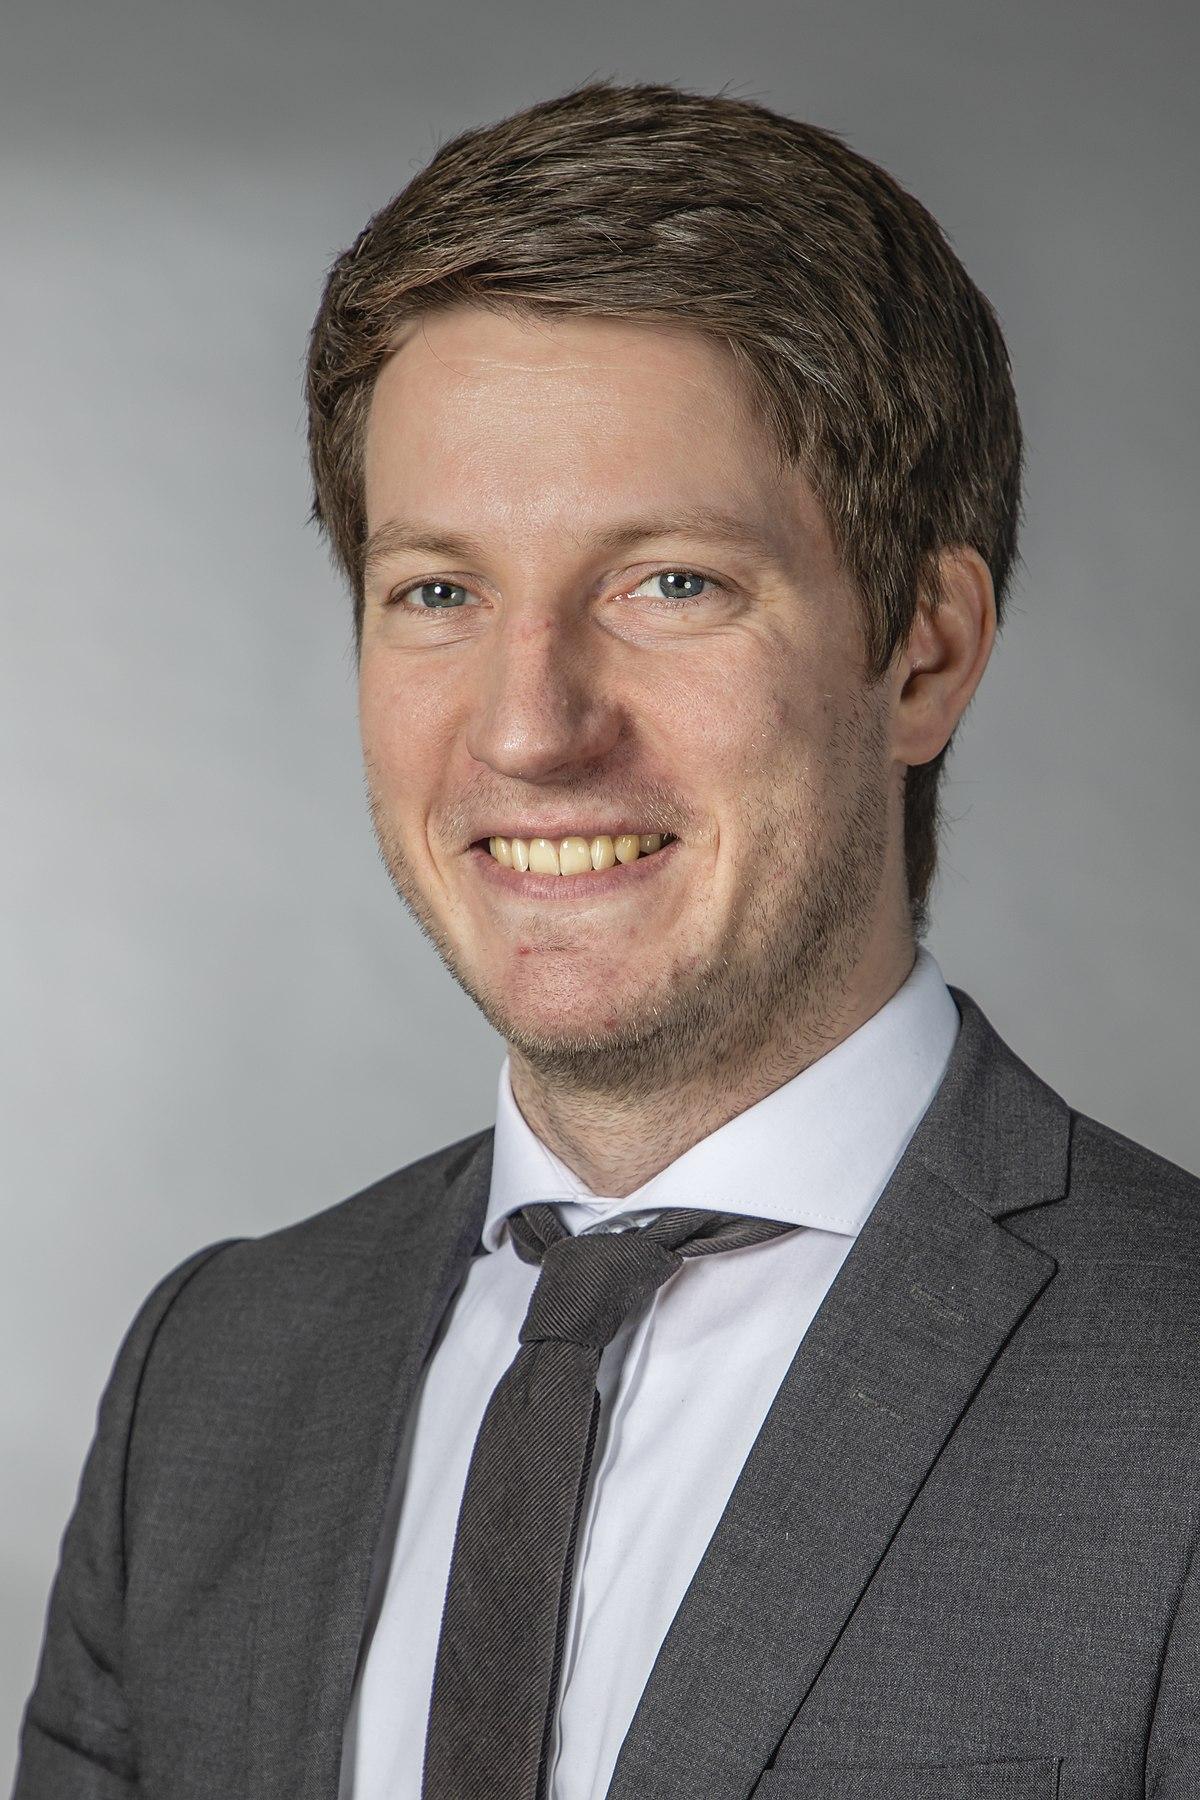 Martin Vincentz